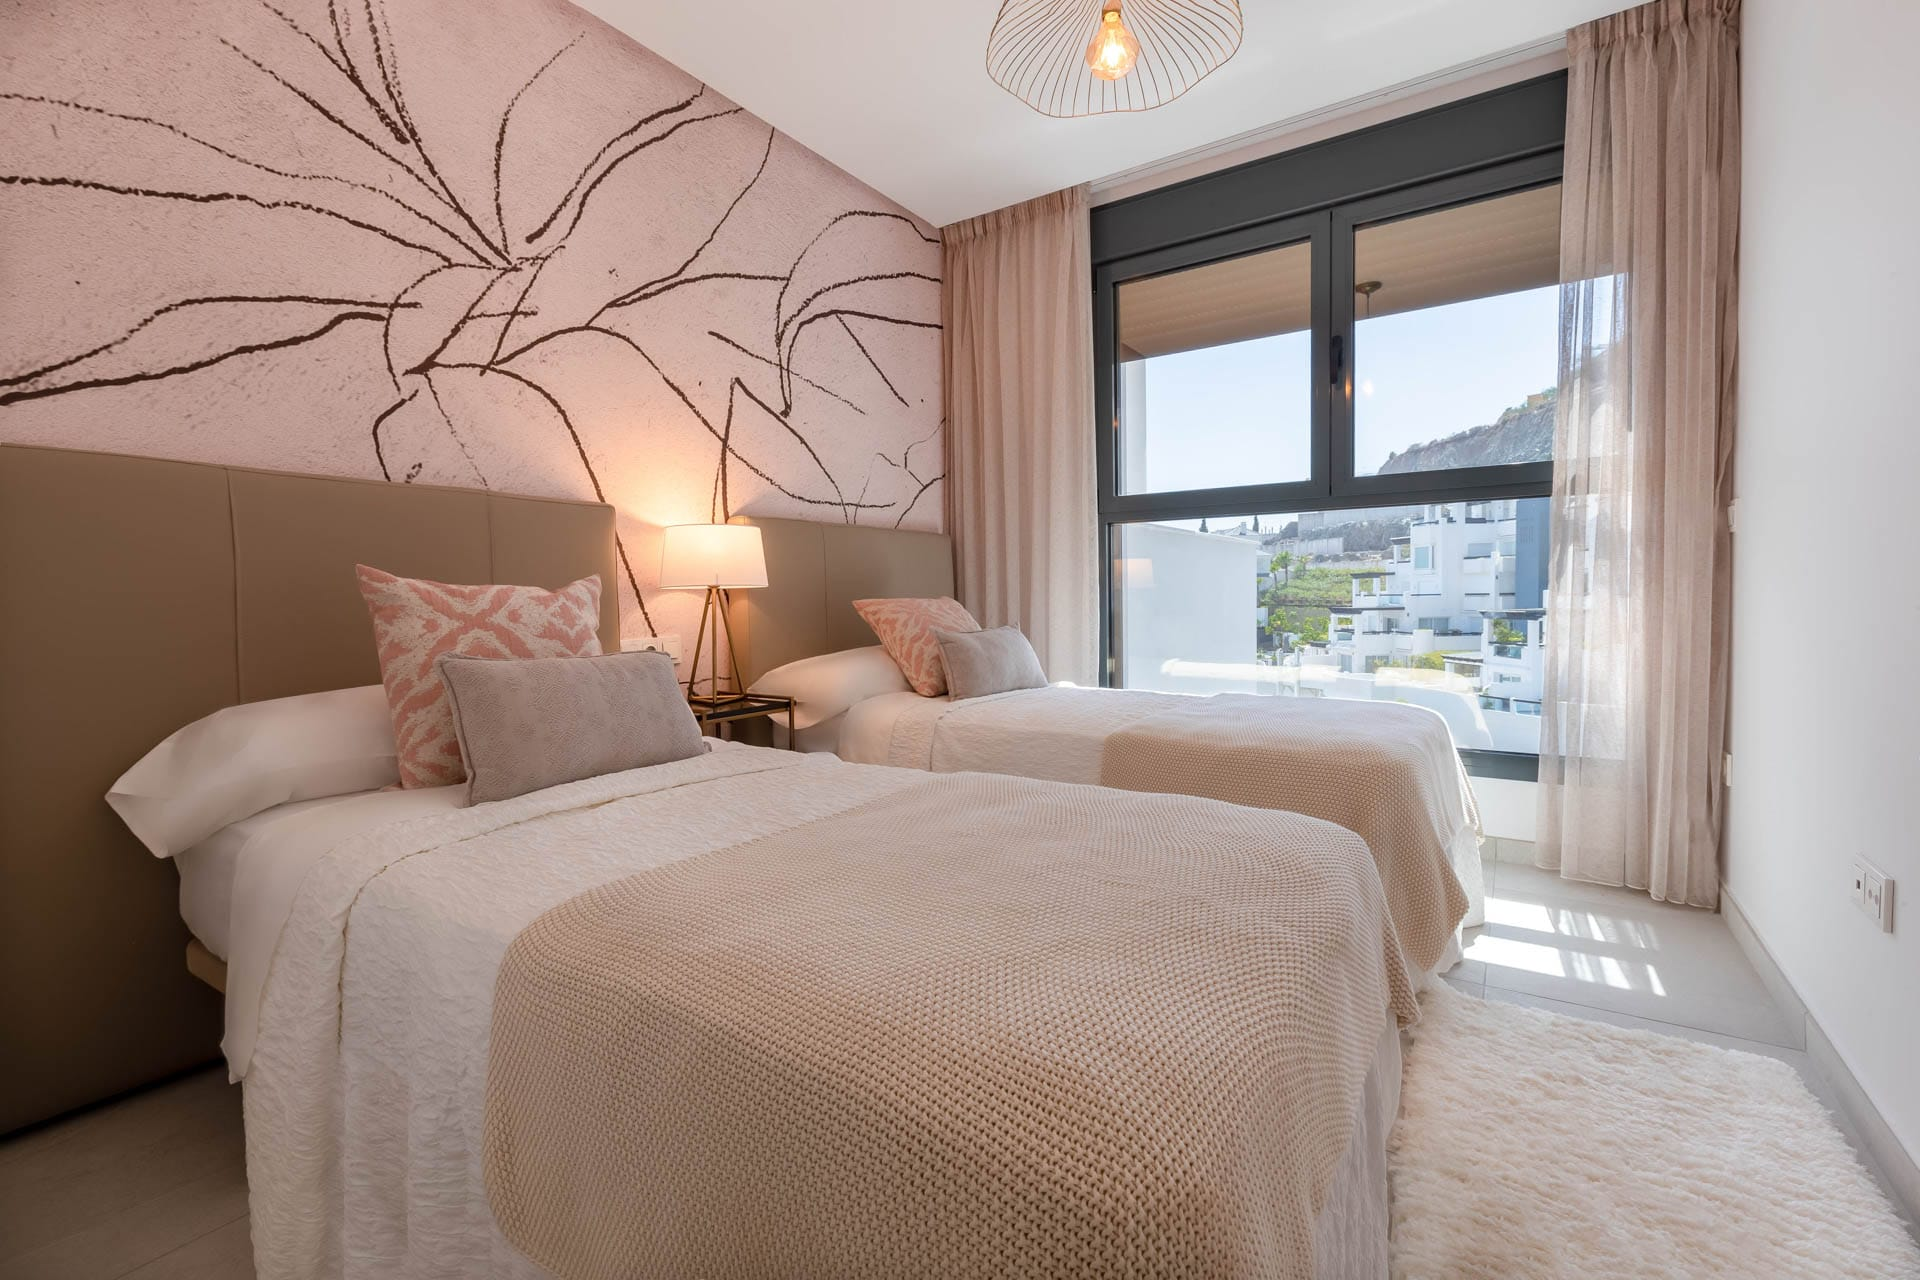 04 - Bedroom 2 - Alborada Homes - Full Res